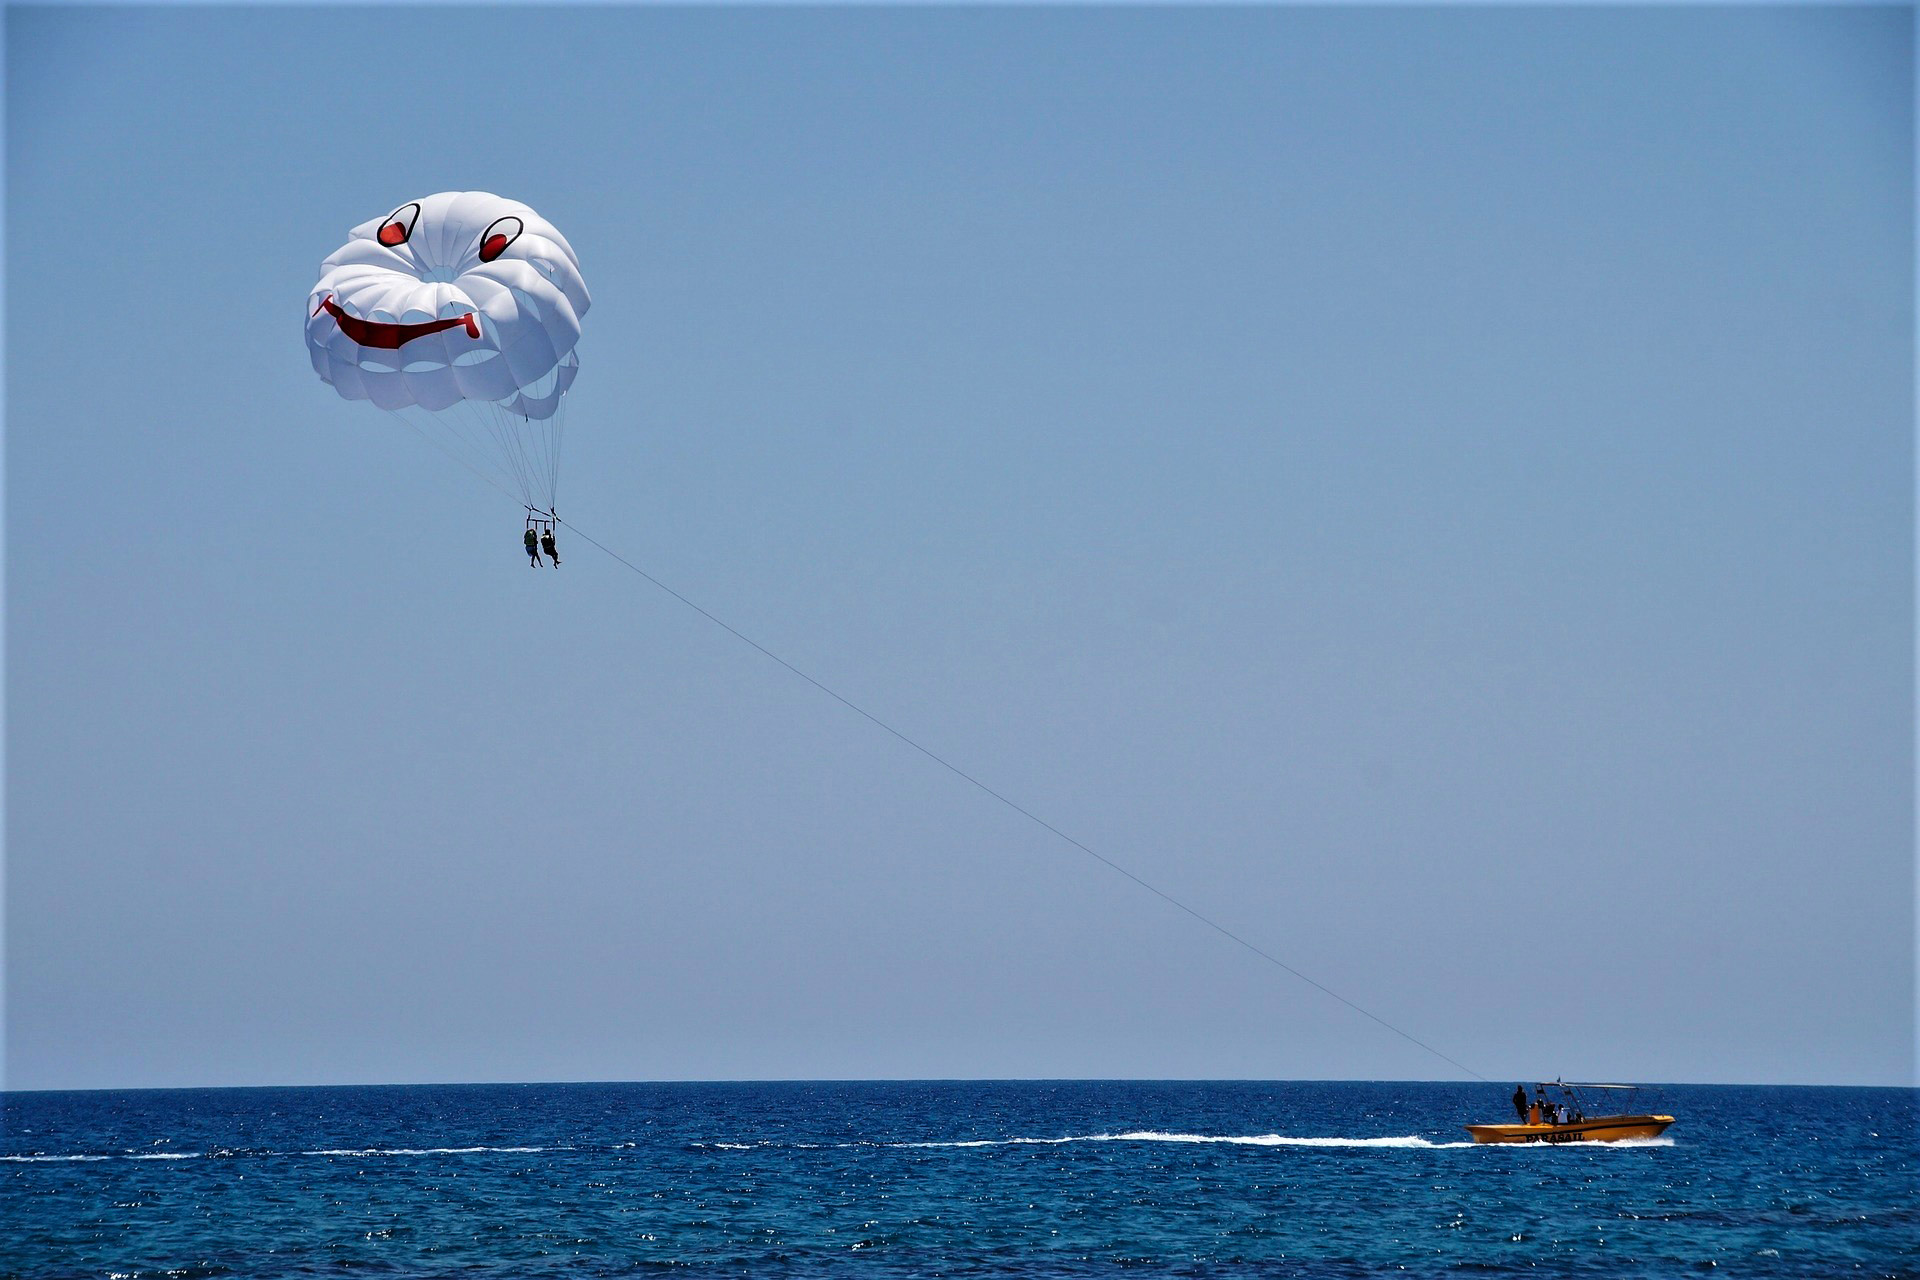 Cosa fare a Skiathos: fare parasailing